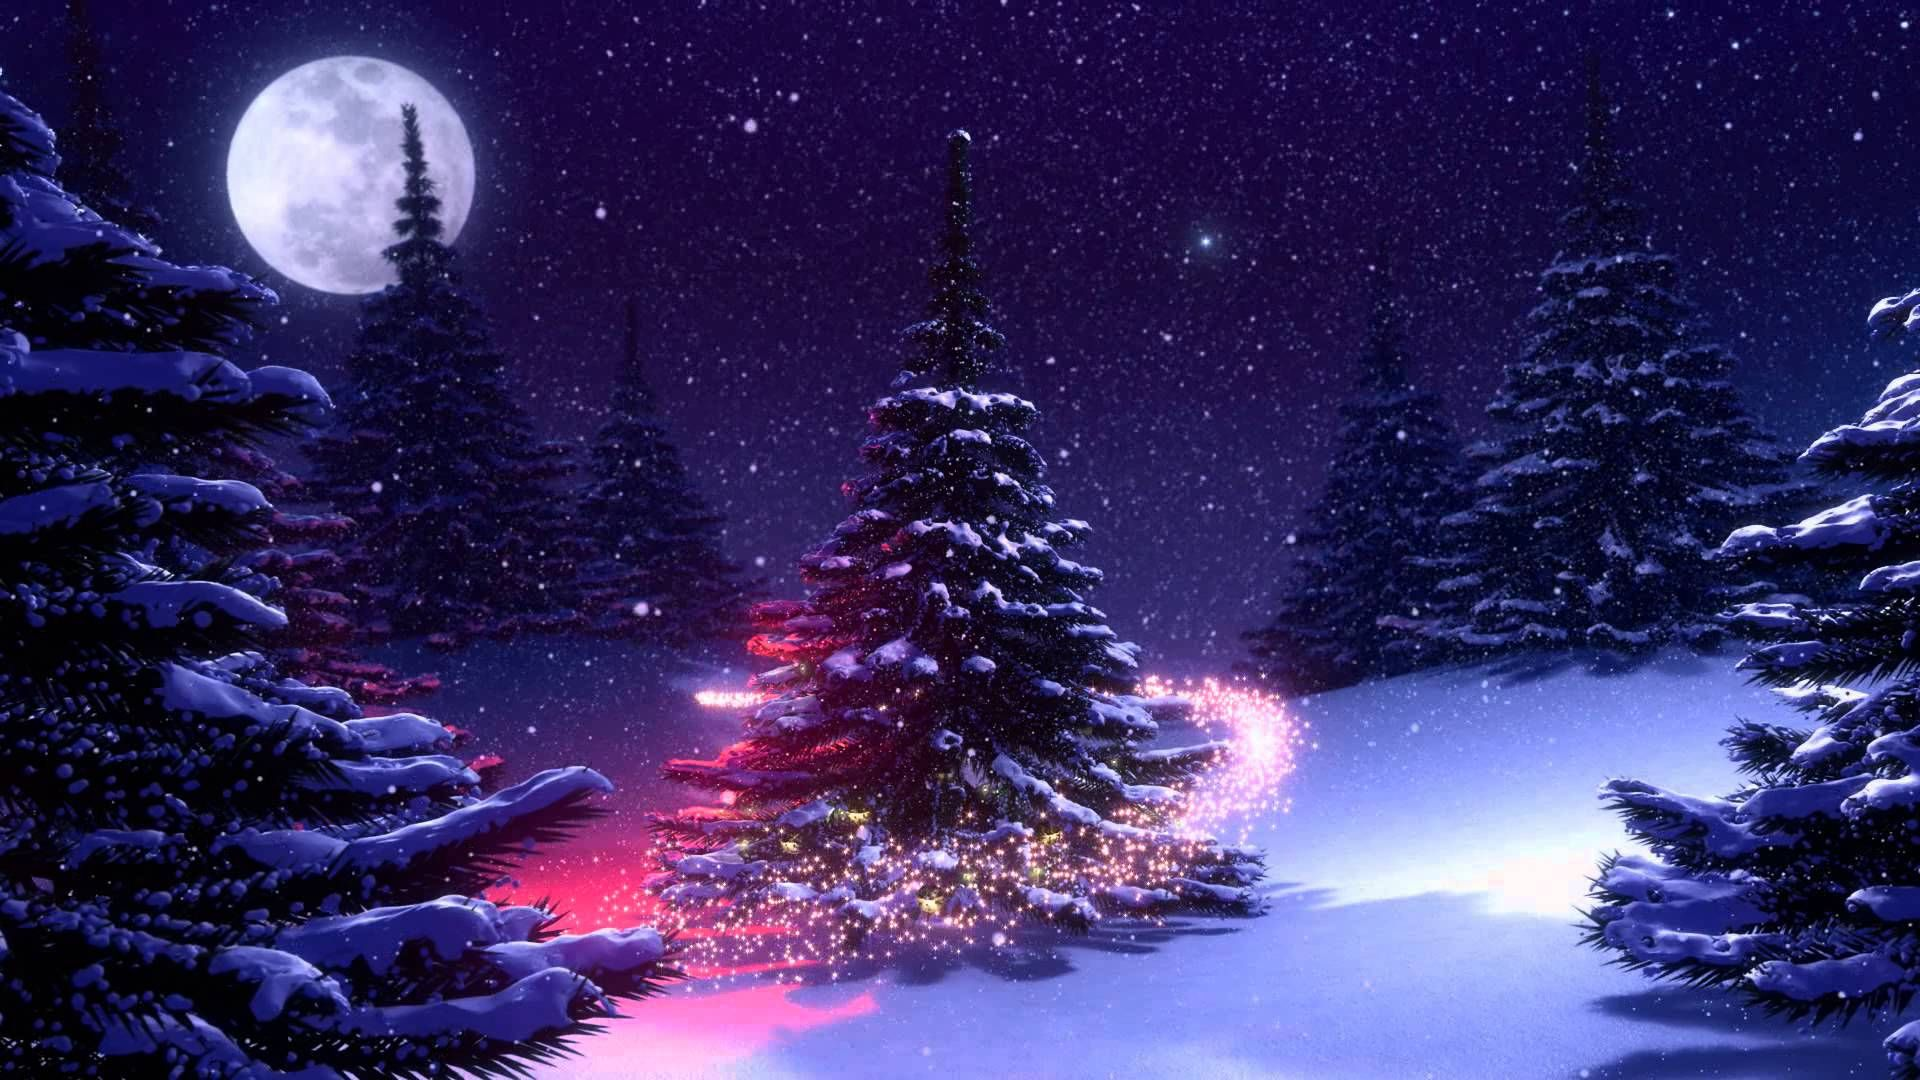 Fondos Navidad Animados: Fondos Animados Árbol De Navidad Nieve Full HD Animated